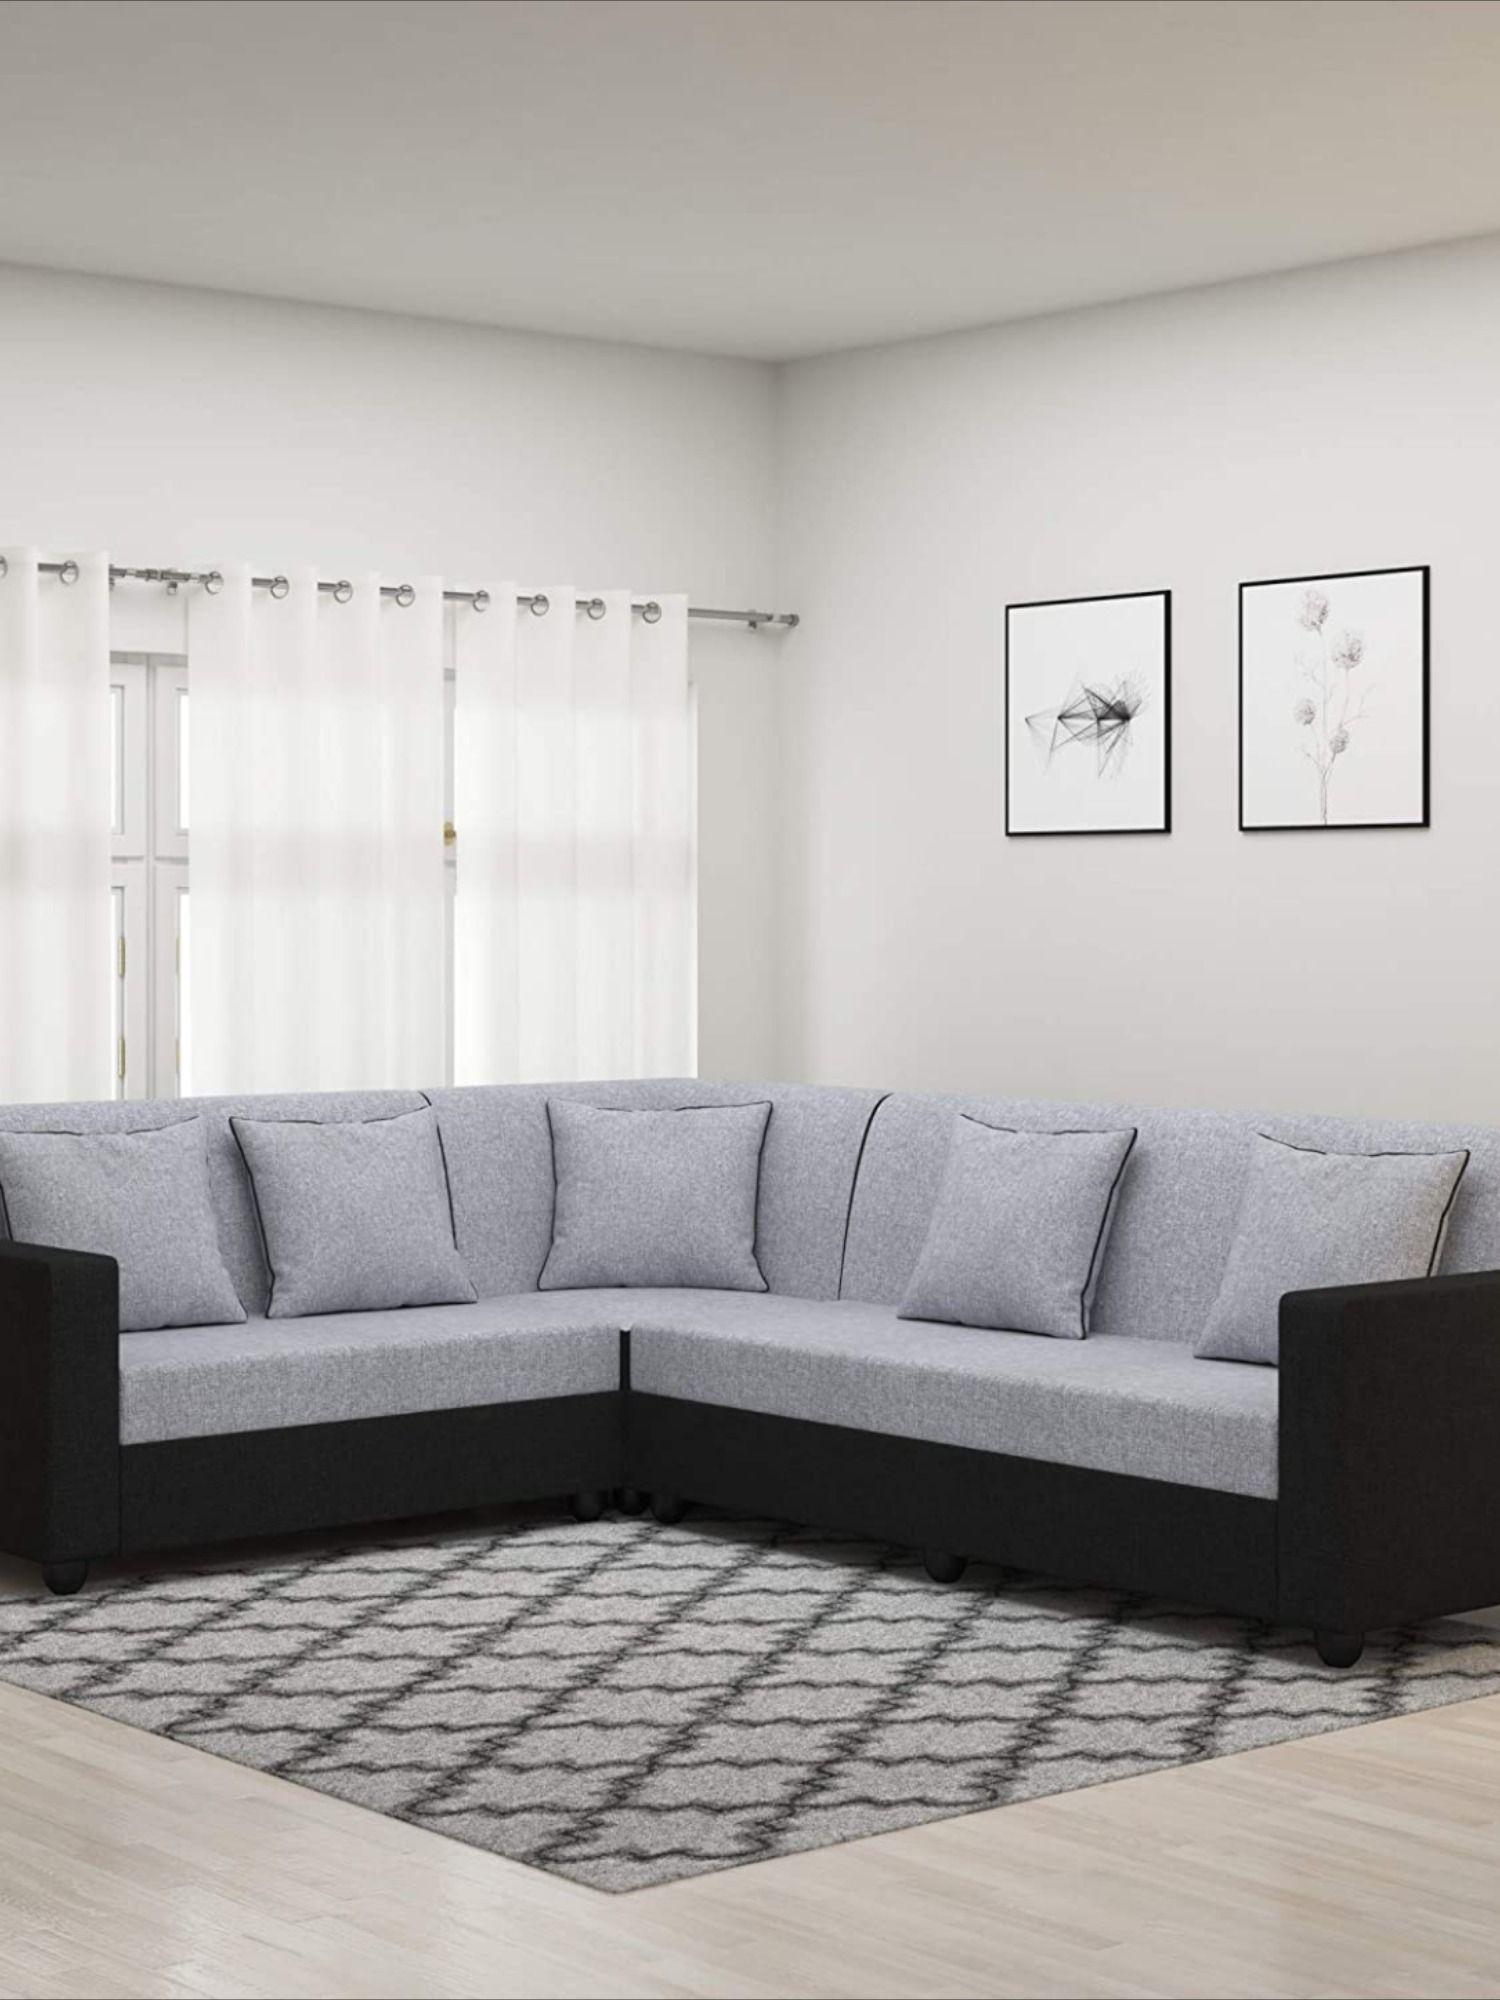 Cosmo Plus Fabric L Shape Acacia Wood Sofa For Home In 2020 Living Room Sofa Set Wood Sofa Bedroom Cupboard Designs